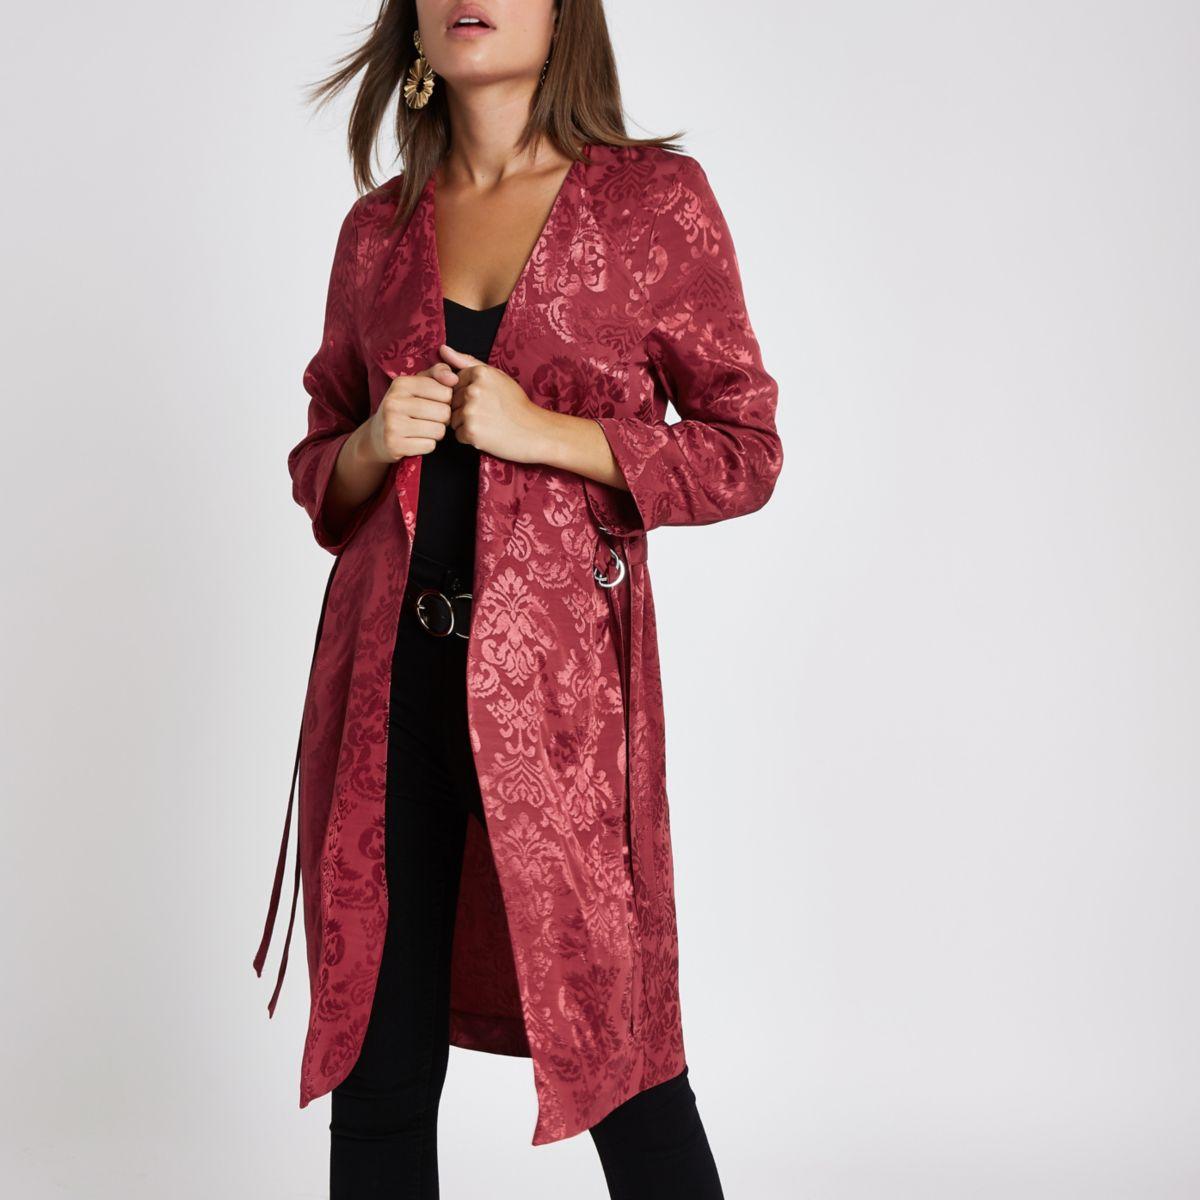 Pink jacquard print duster jacket